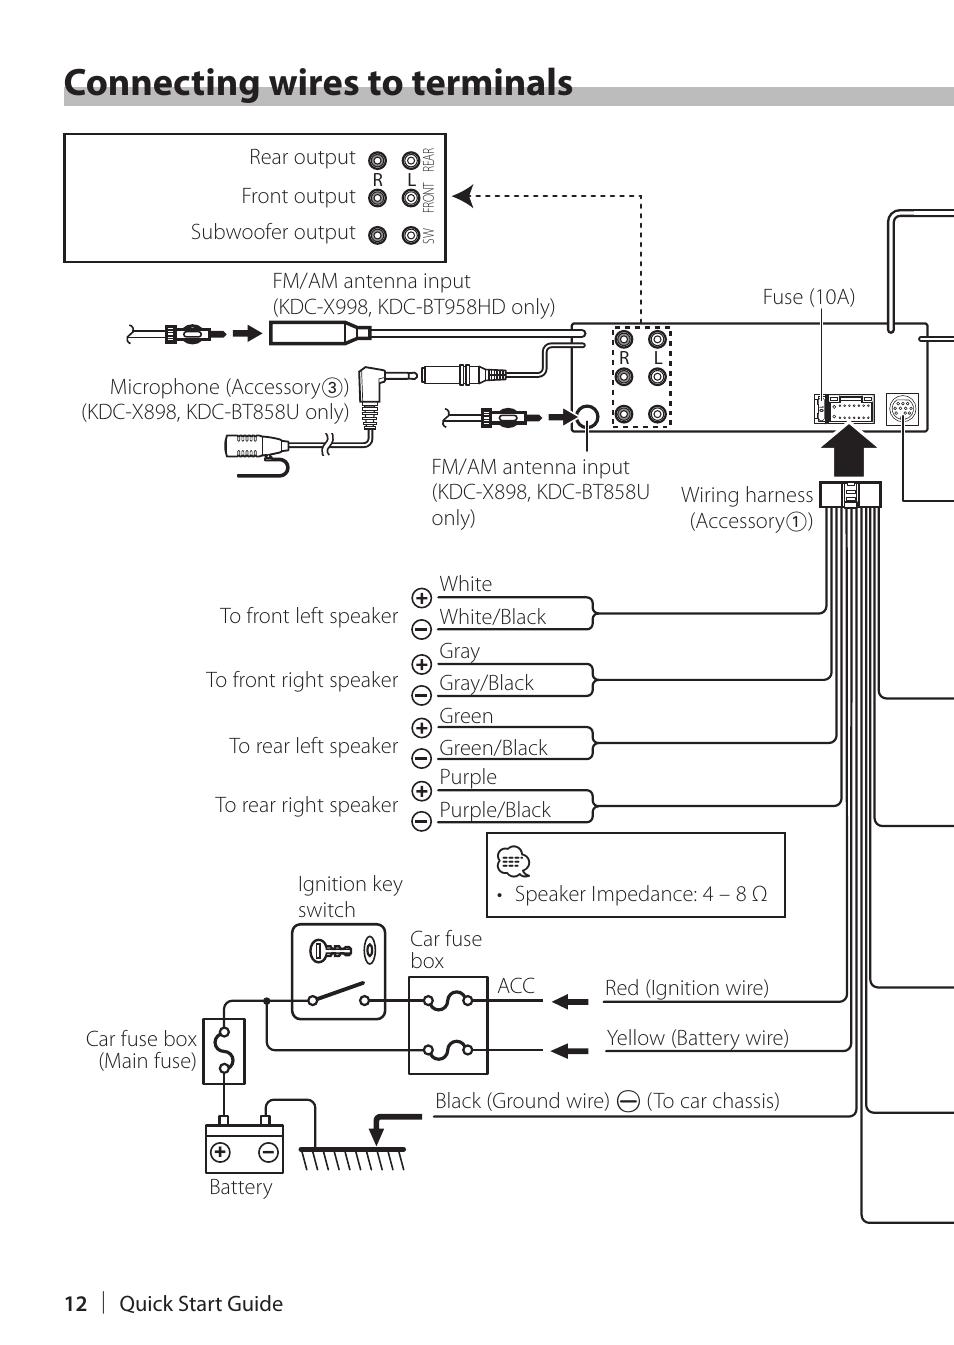 Kenwood ddx512 wiring harness diagram somurich kenwood ddx512 wiring harness diagram kenwood dnx5120 wiring harness diagram wiring diagramdesign cheapraybanclubmaster Images